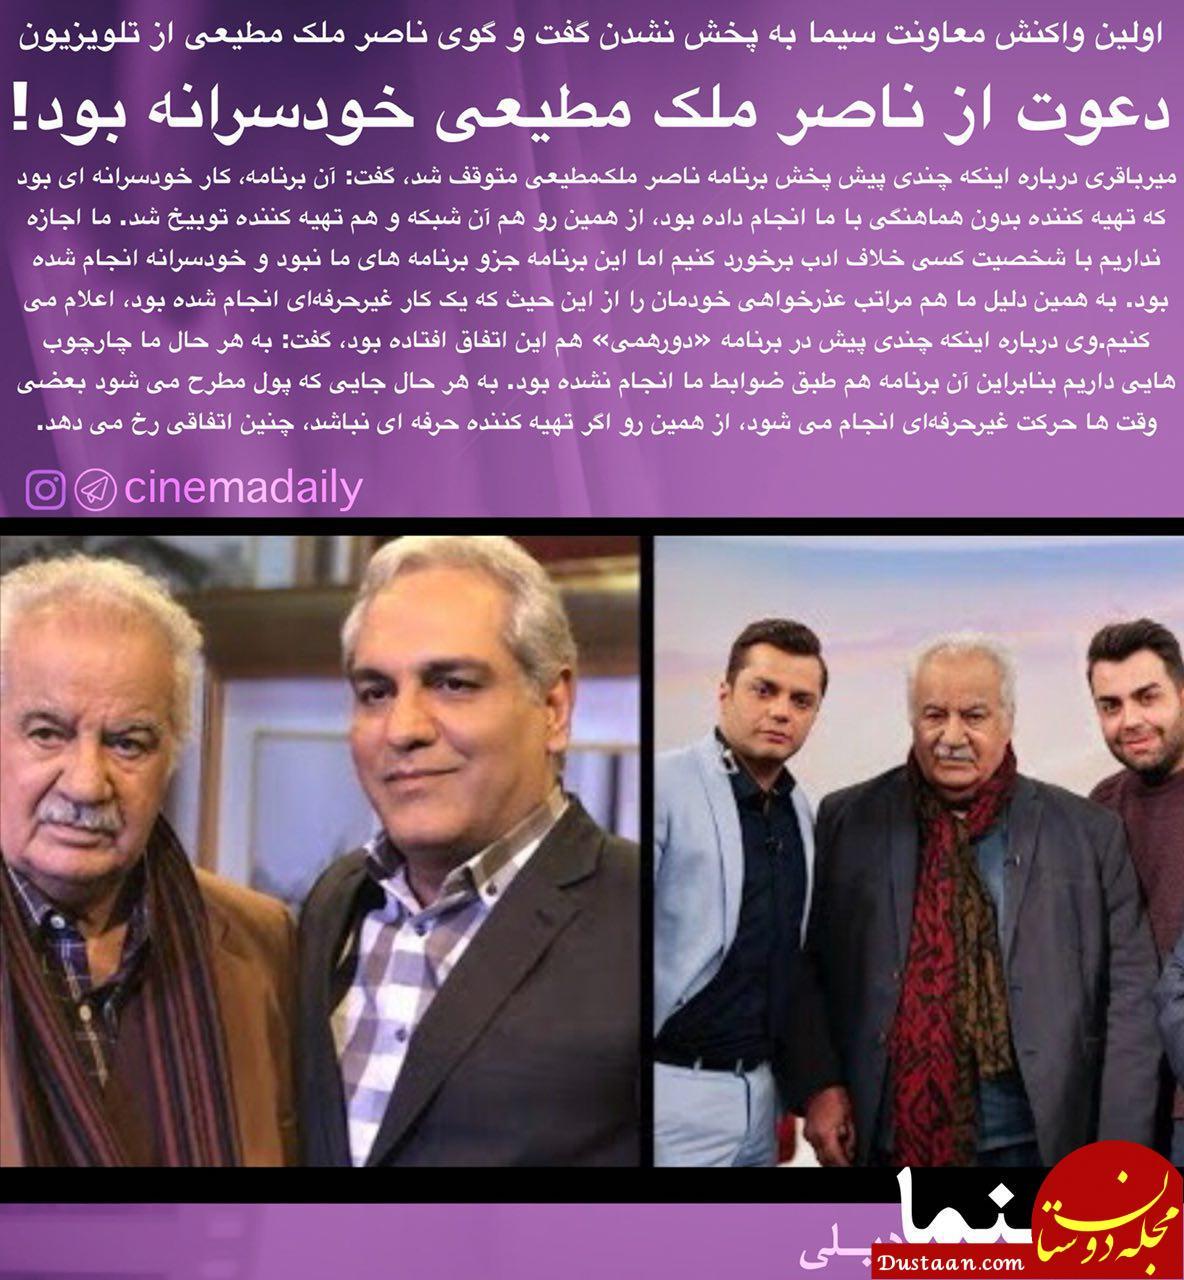 www.dustaan.com دعوت ناصر ملک مطیعی به دو برنامه تلویزیون خودسرانه بود! +عکس